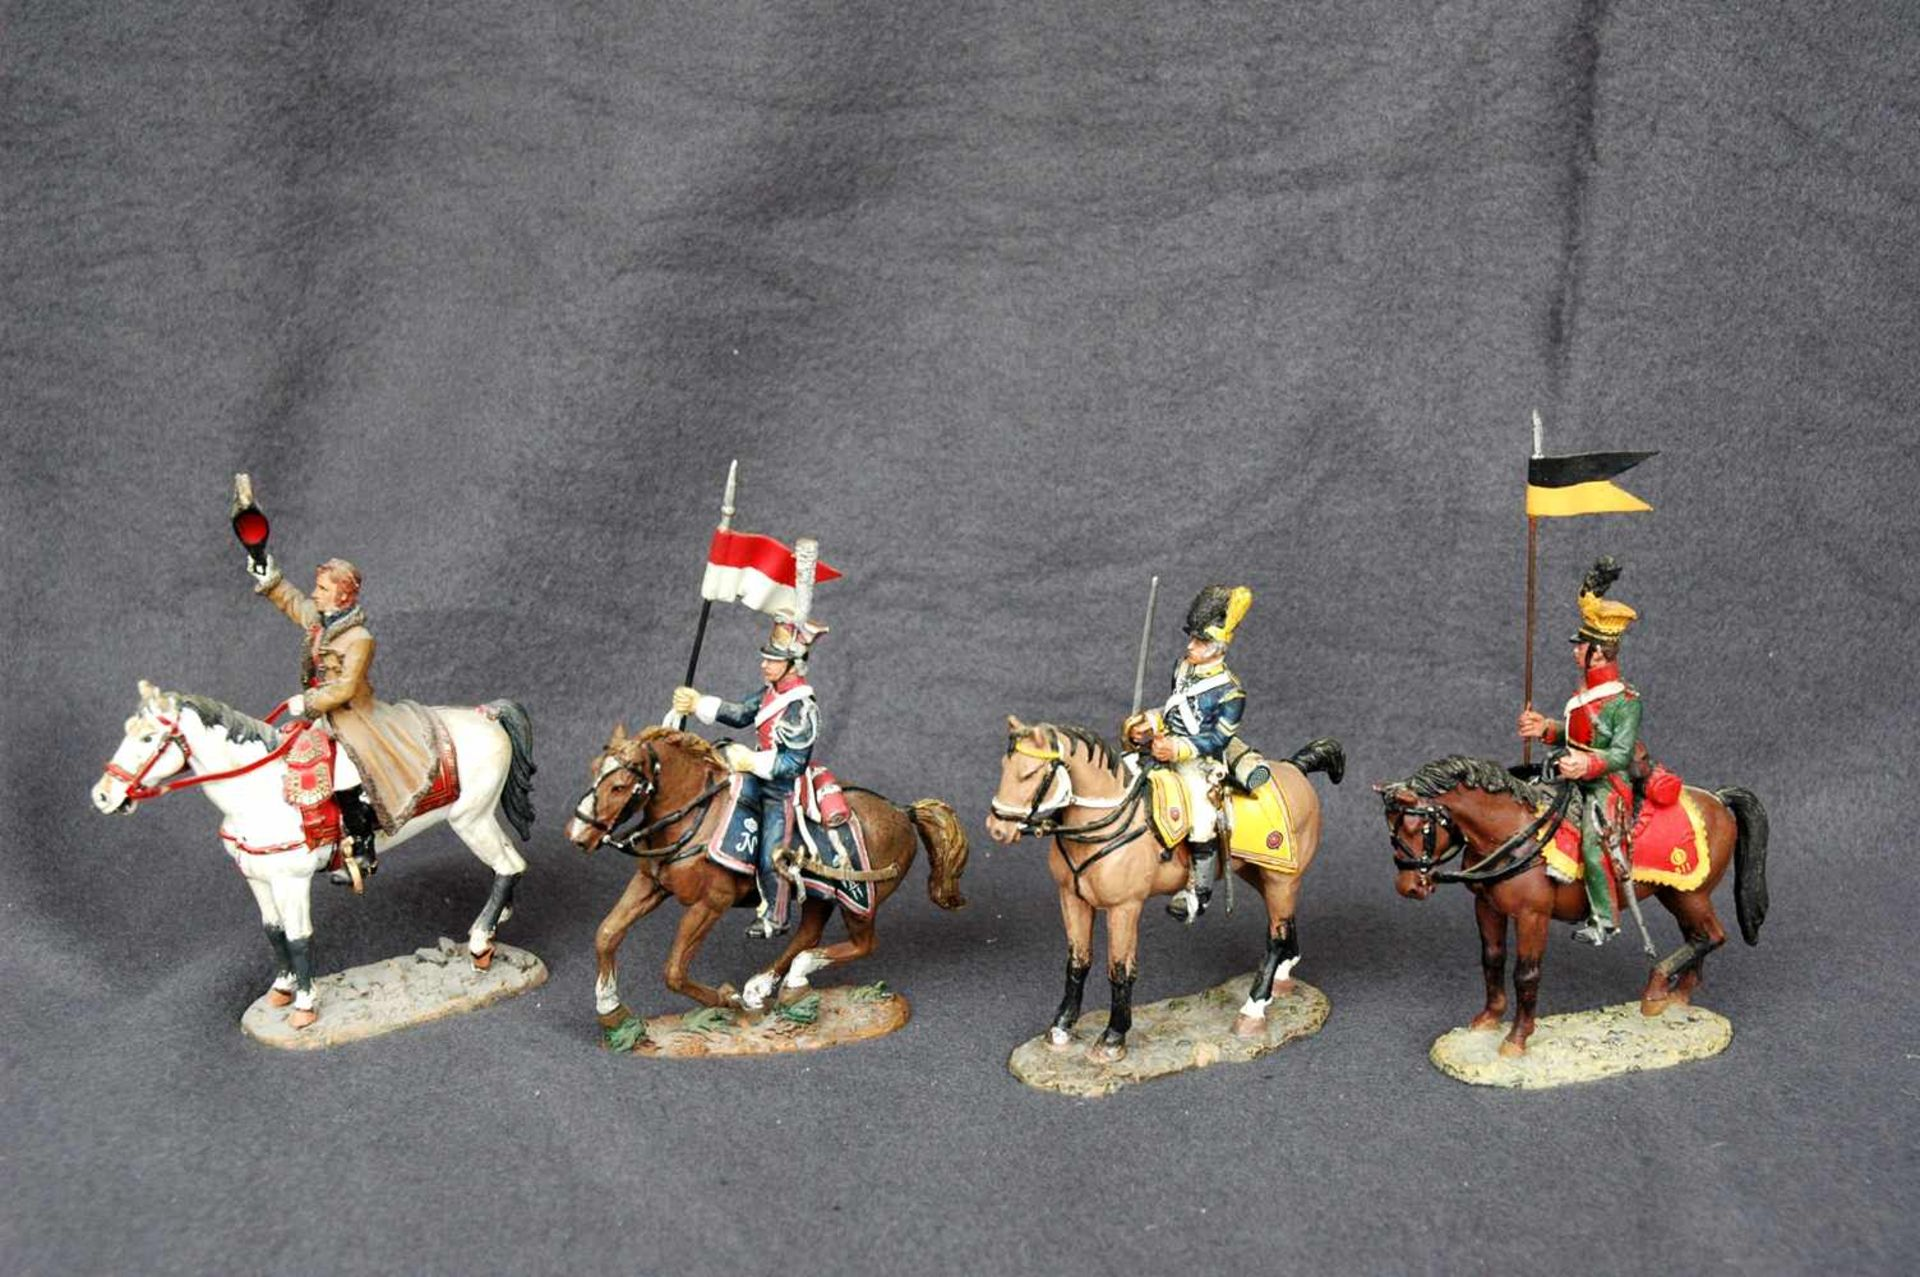 Zinn-Sammelfiguren, delprado: 66 Kavallerie-Figuren, Napoleonische Kriege - Bild 3 aus 4